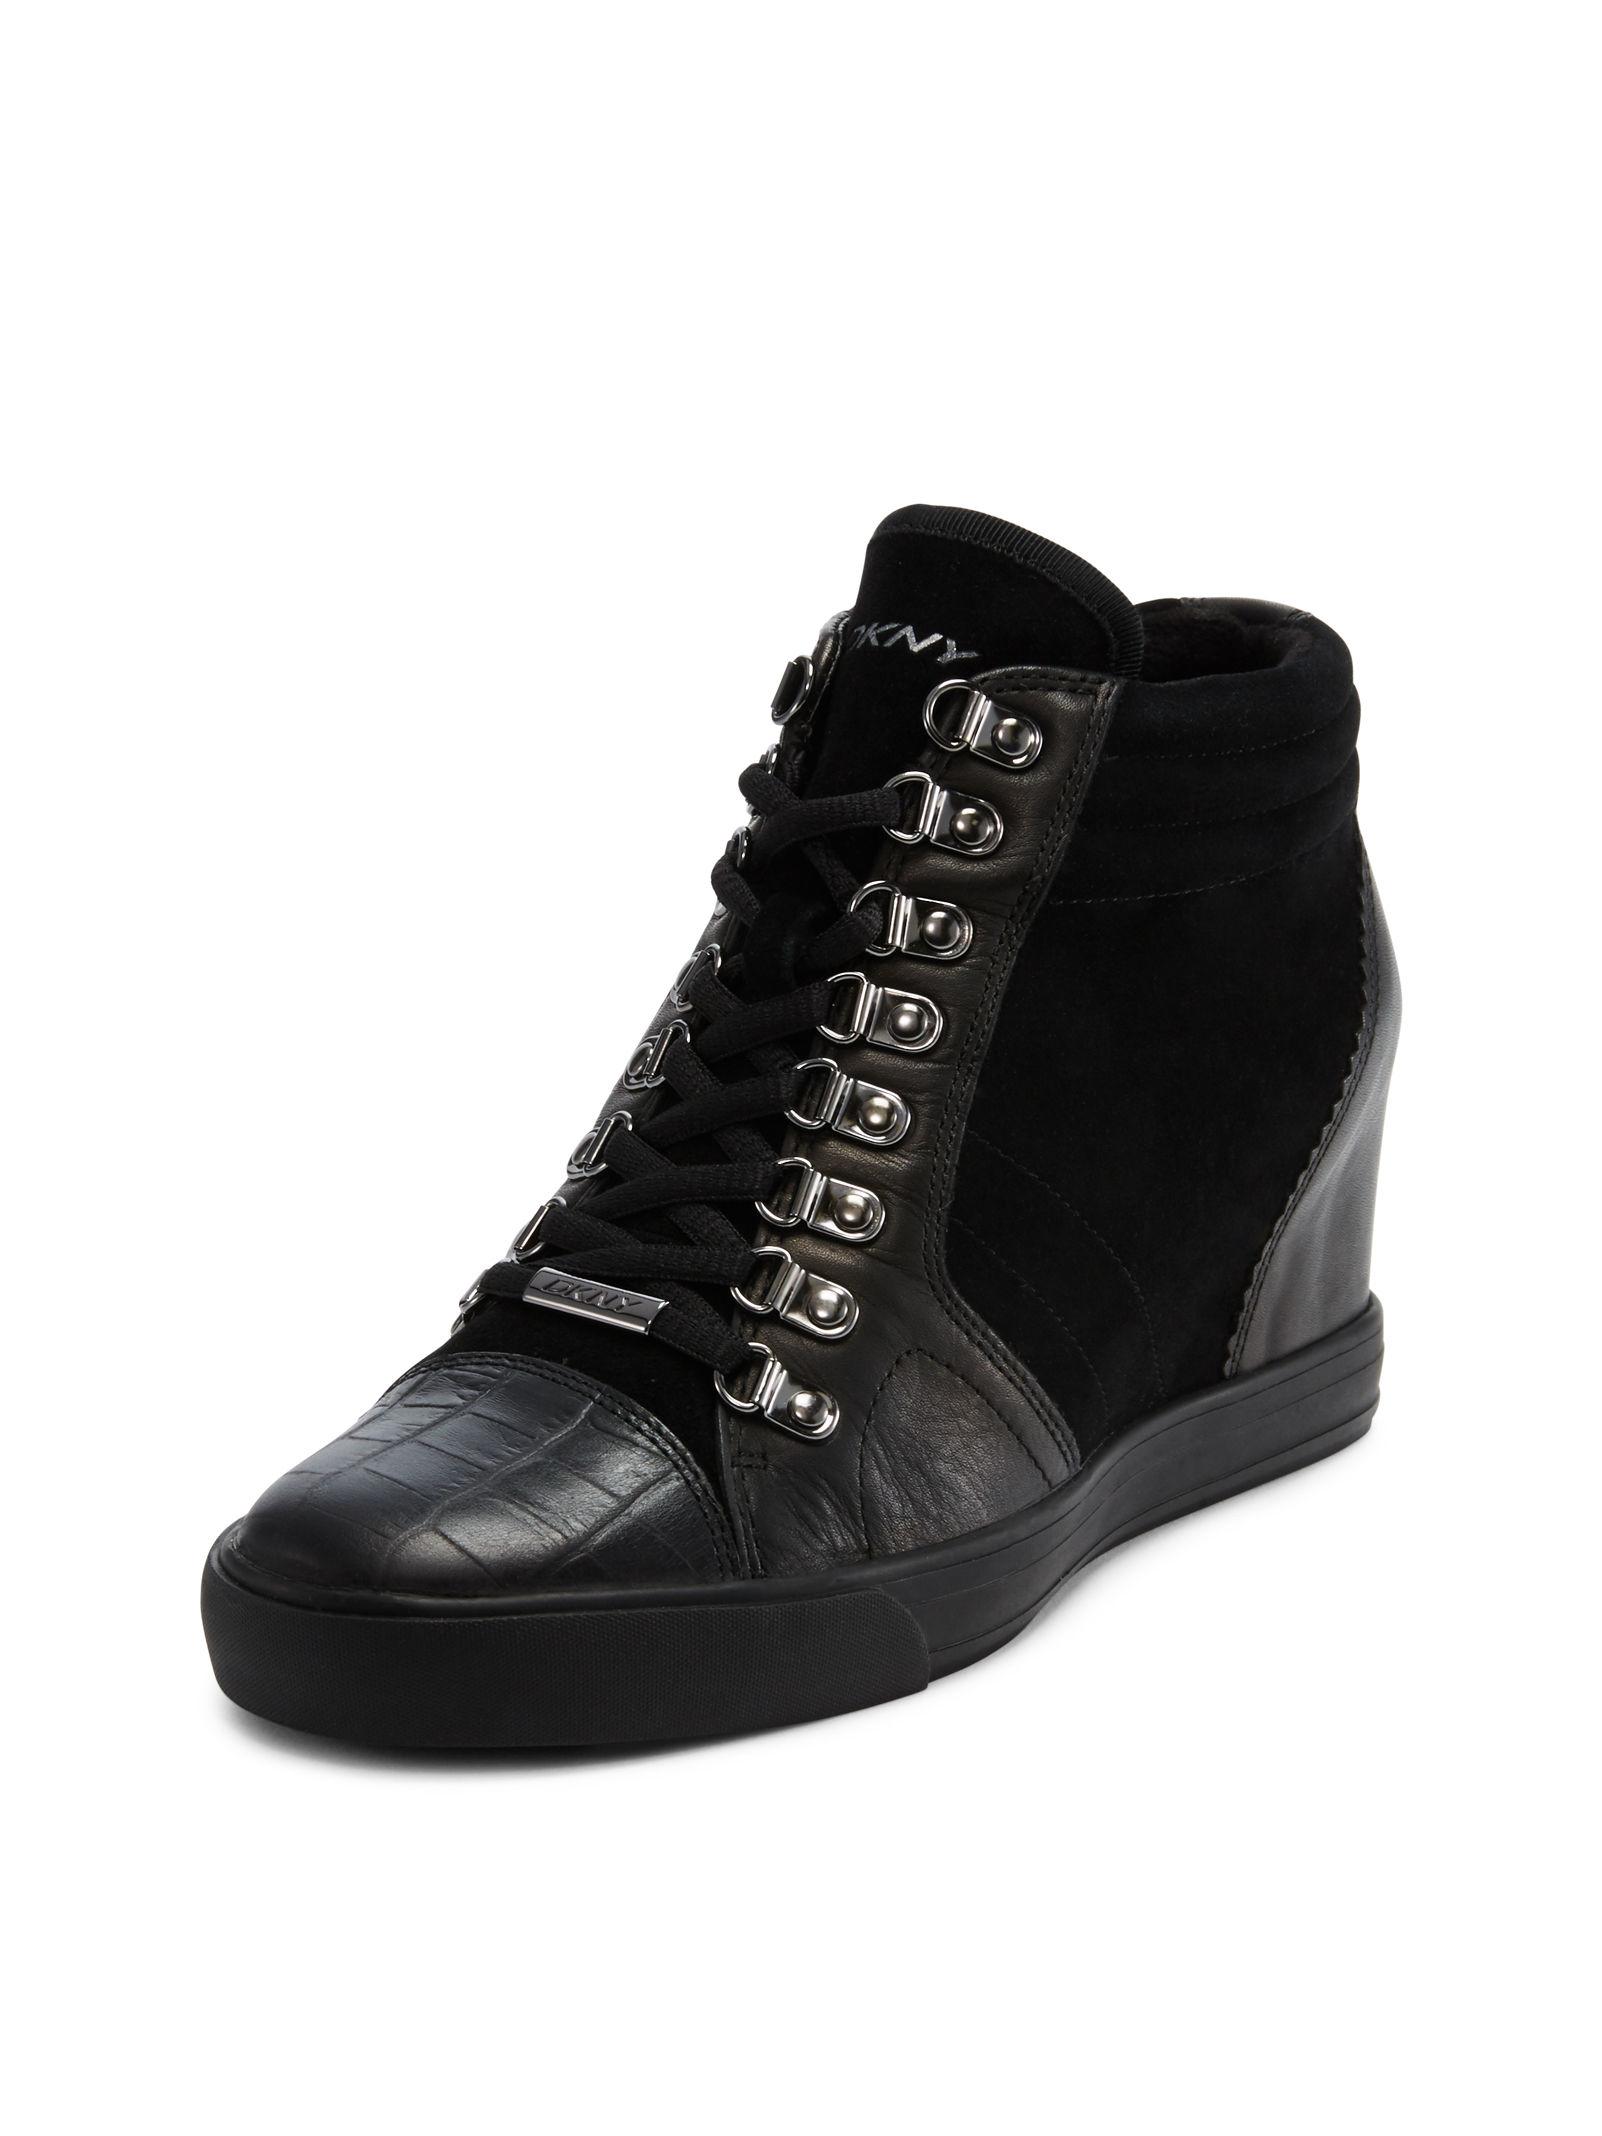 d3e2e7c09c86 Lyst - DKNY Cindy Wedge Sneaker in Black